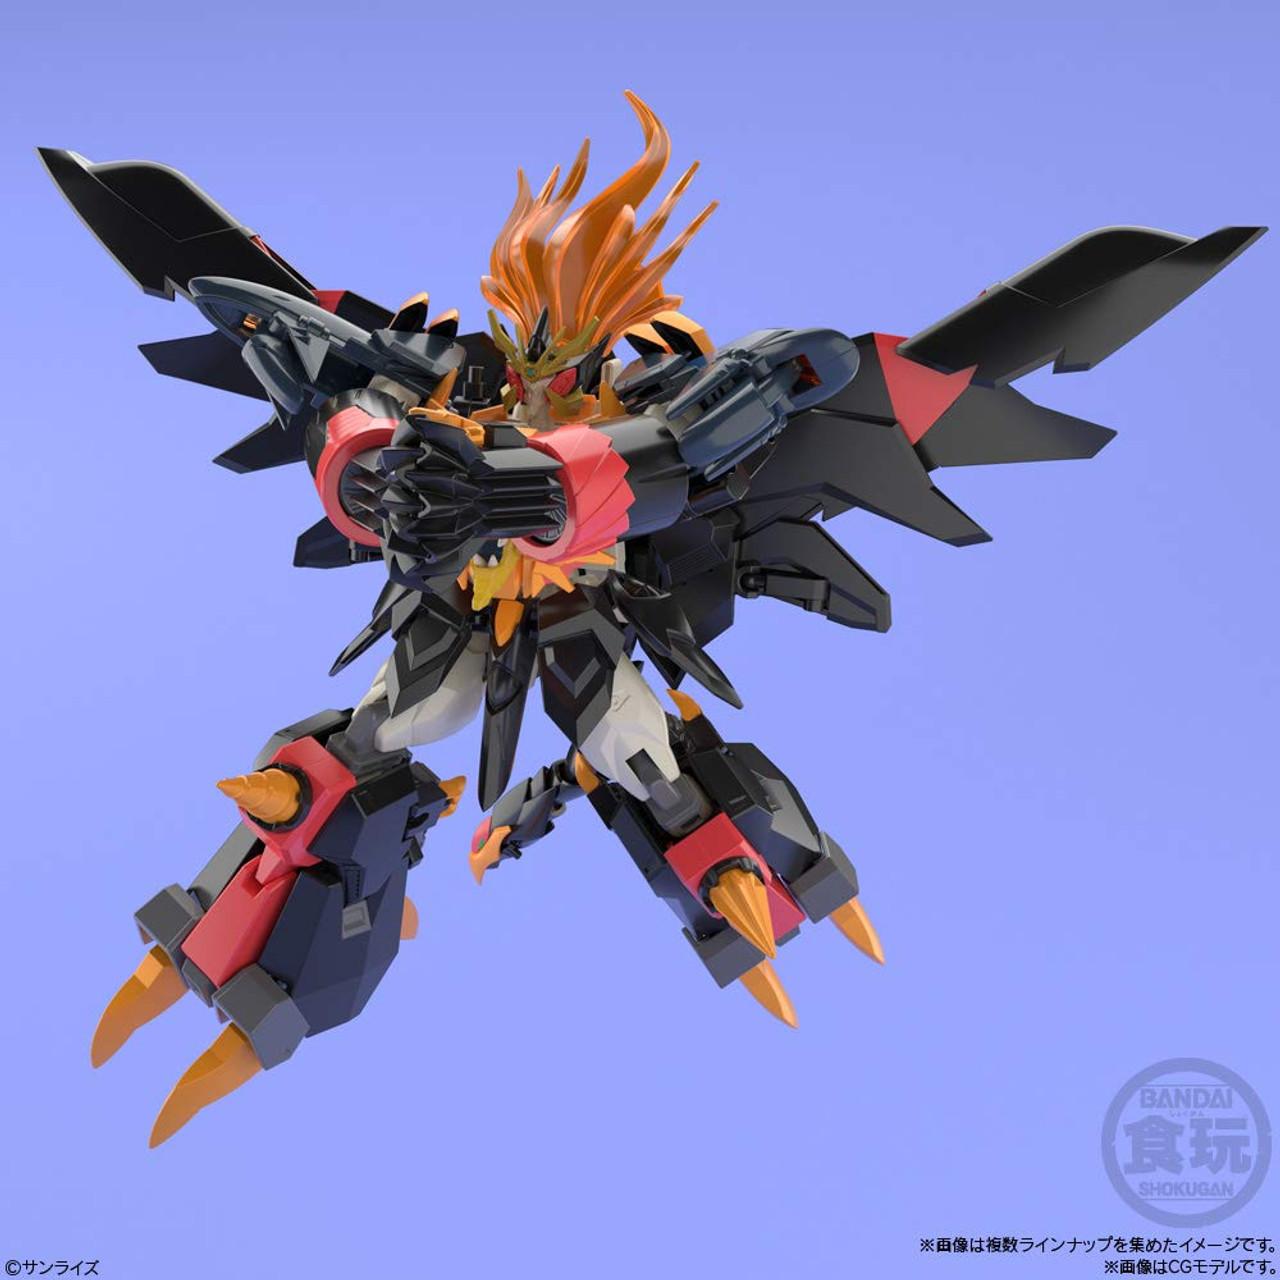 Bandai Super Minipla King of Braves Gaogaigar 4 pcs Full Set Candy Toys